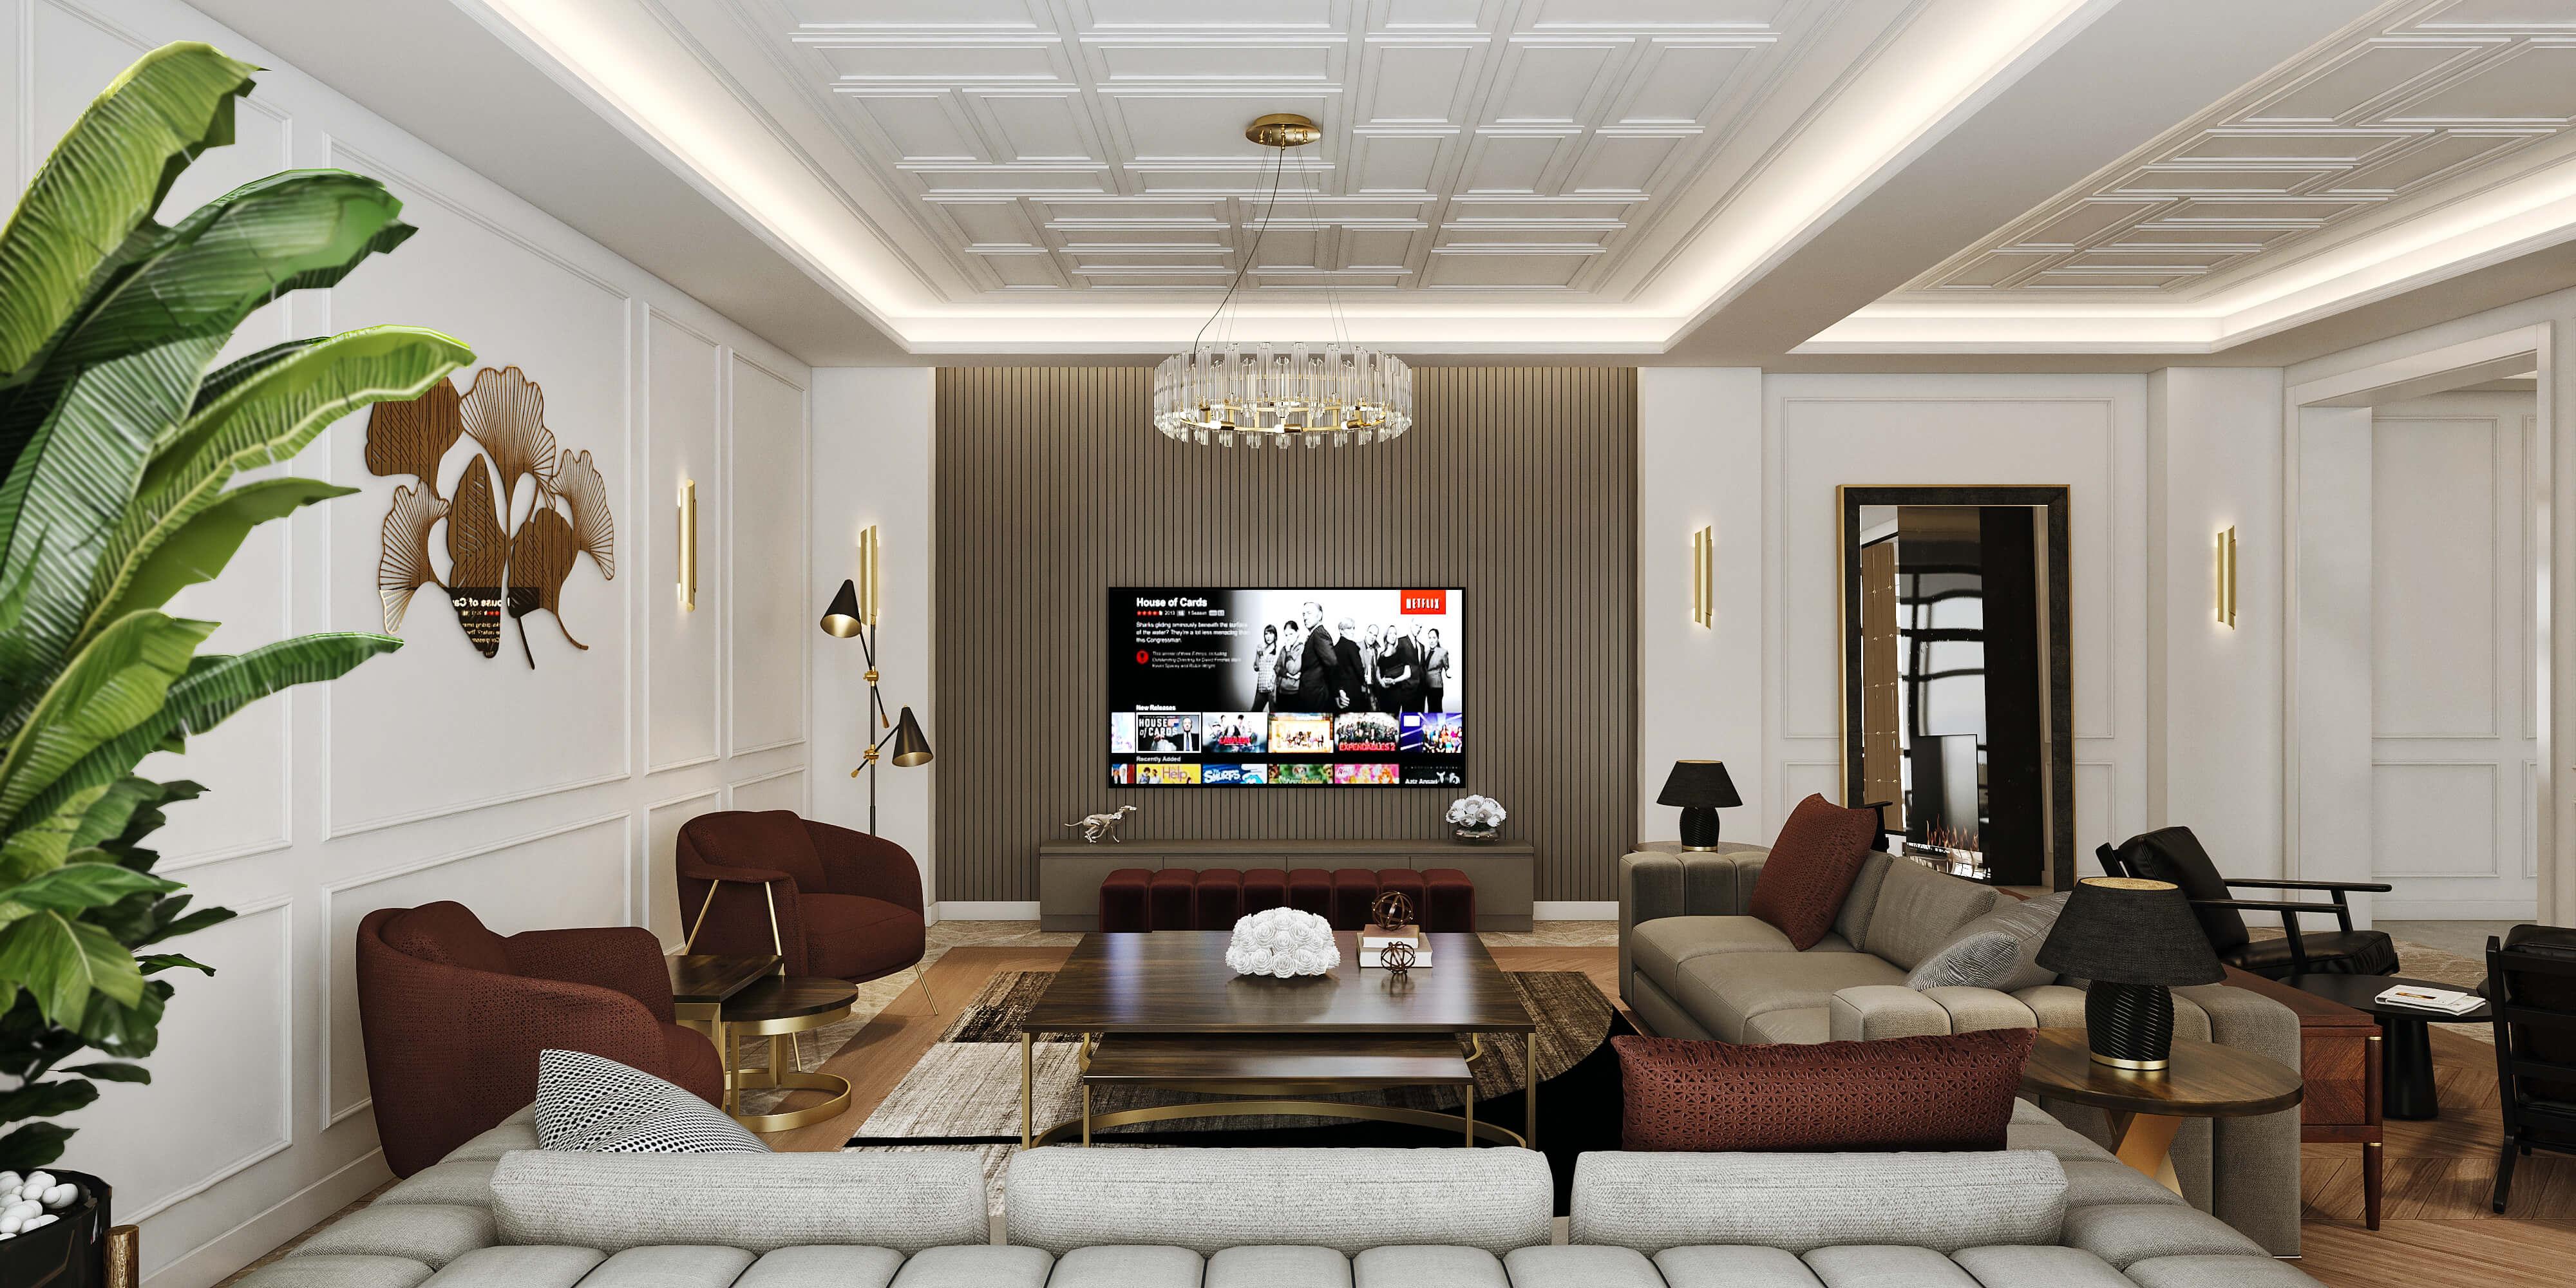 home inspiration 4485 Incek Prestij Dublex Apartment Residential